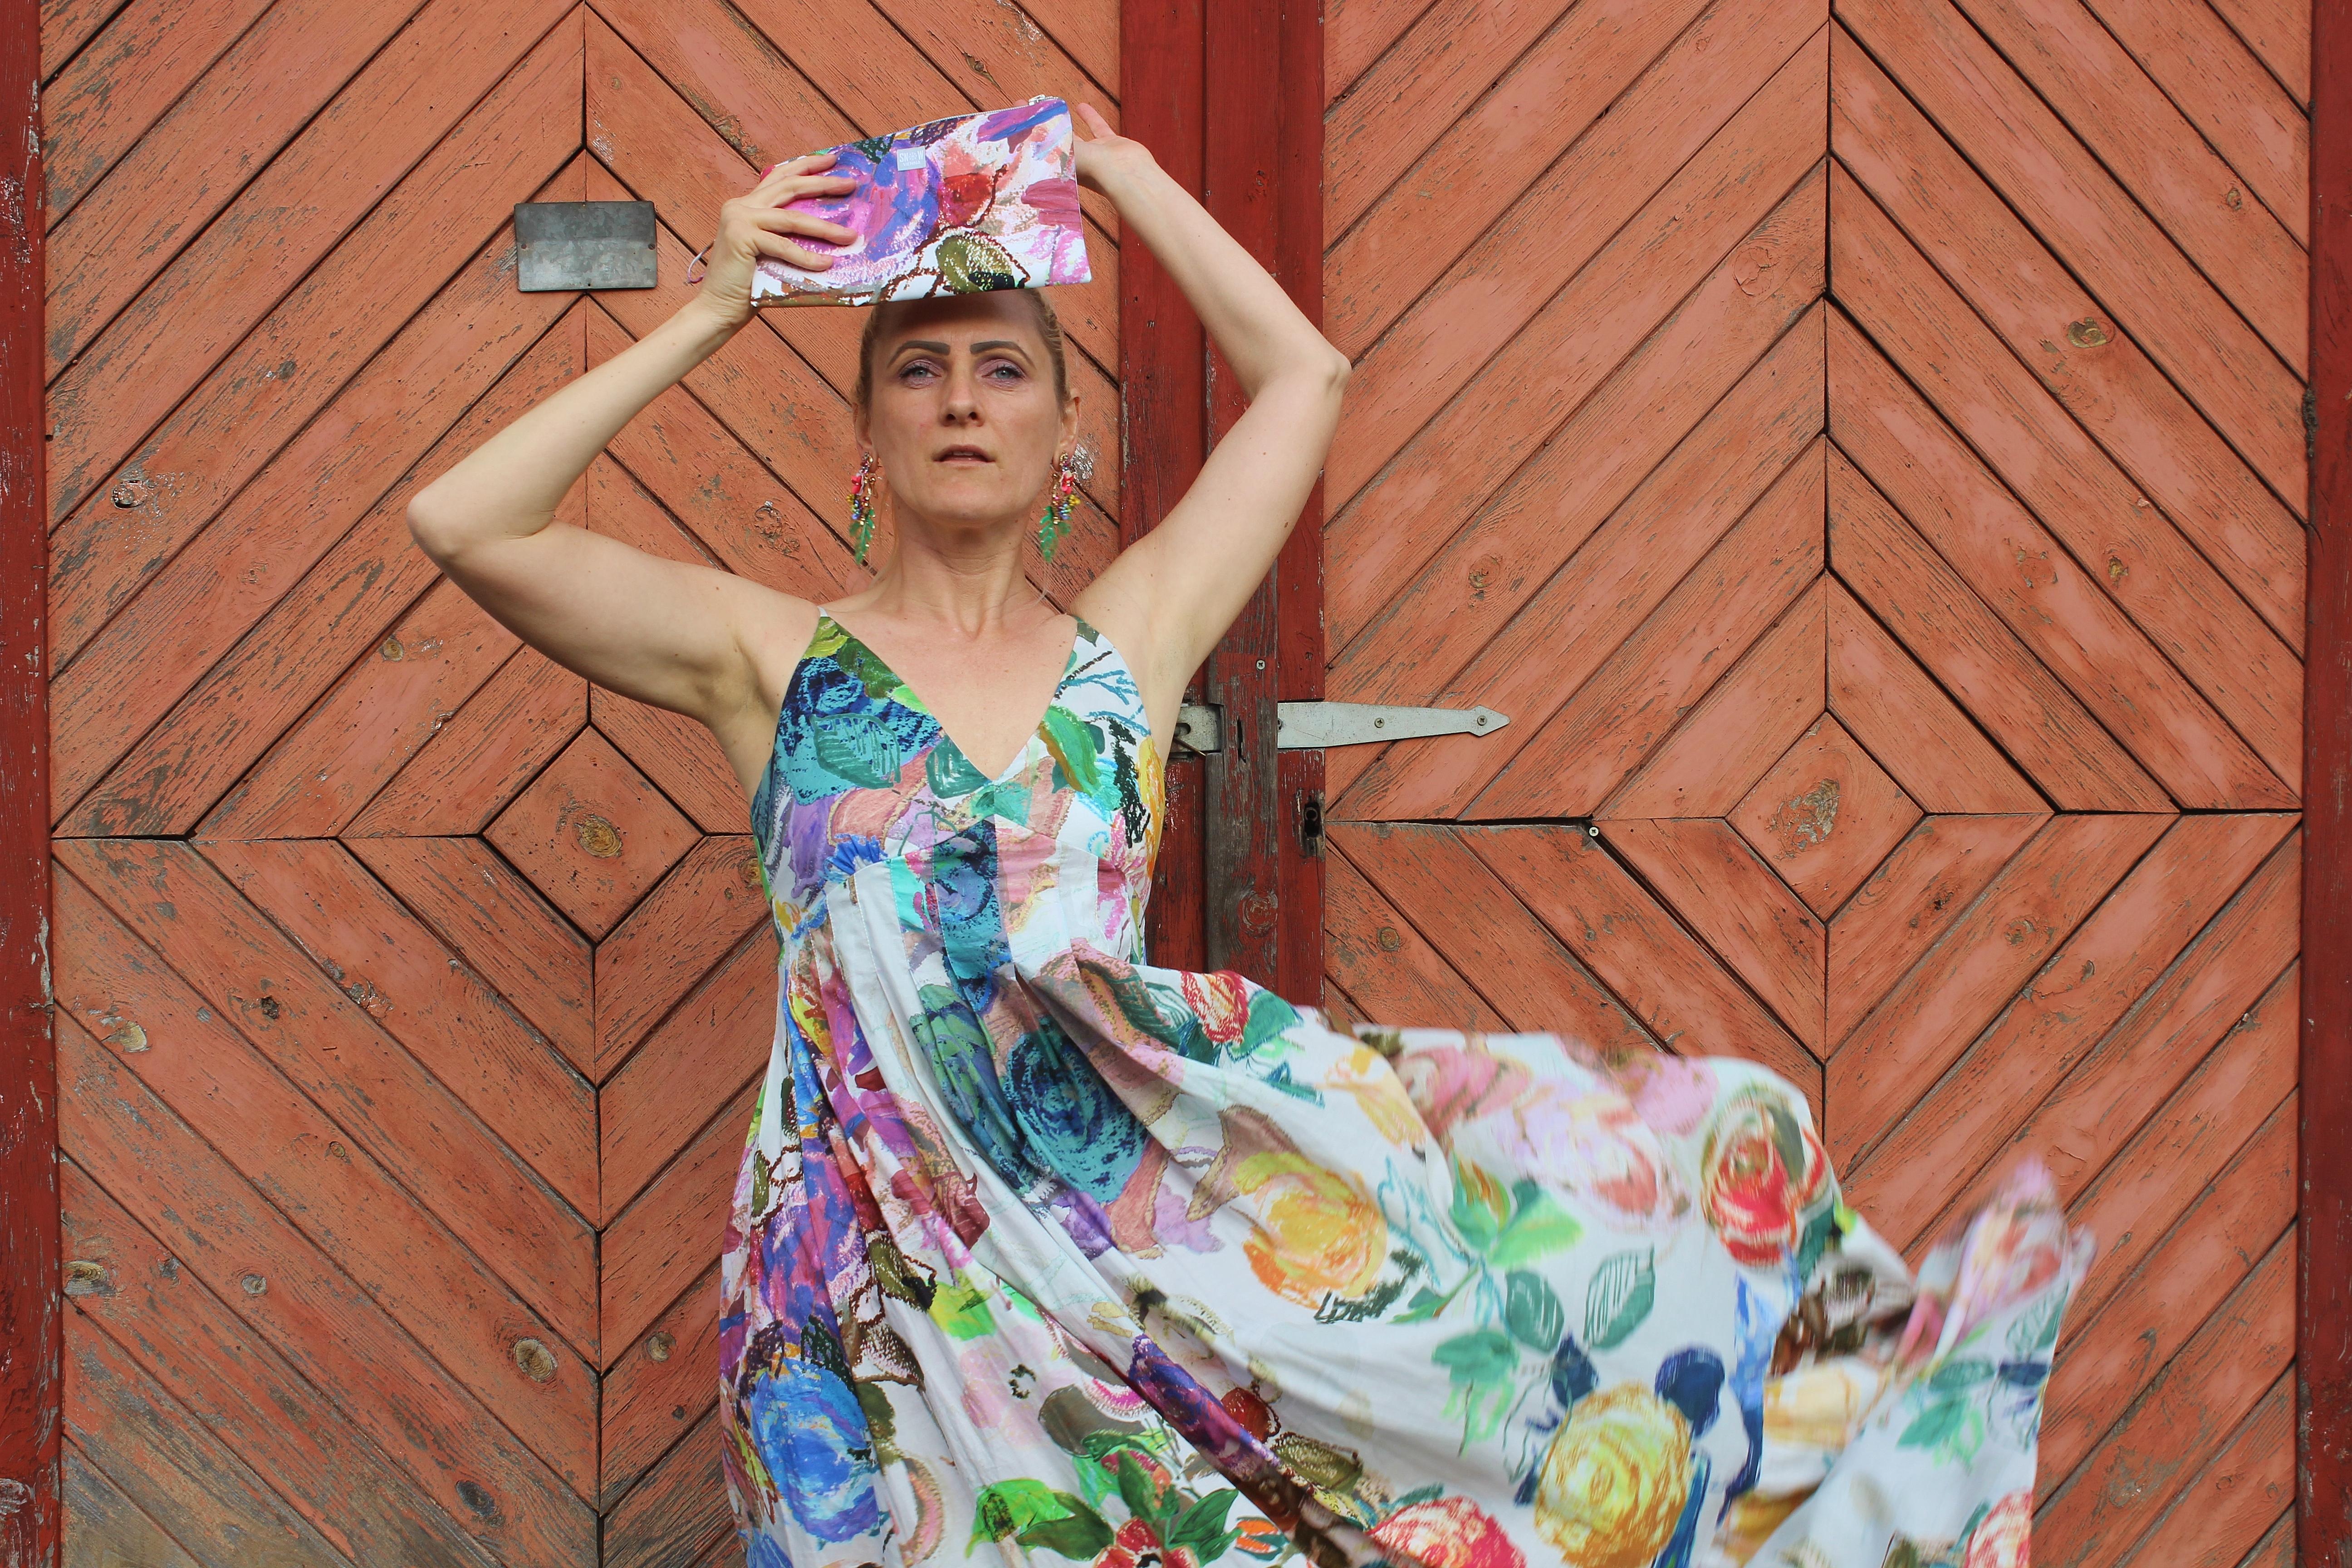 Vanesque-Maxikleid-Snow-Atelier Snow-Wien-Designer-Österreich-New-Kollektion-carrieslifestyle-Saigonese-Floralprint-Dress-Blumenprint